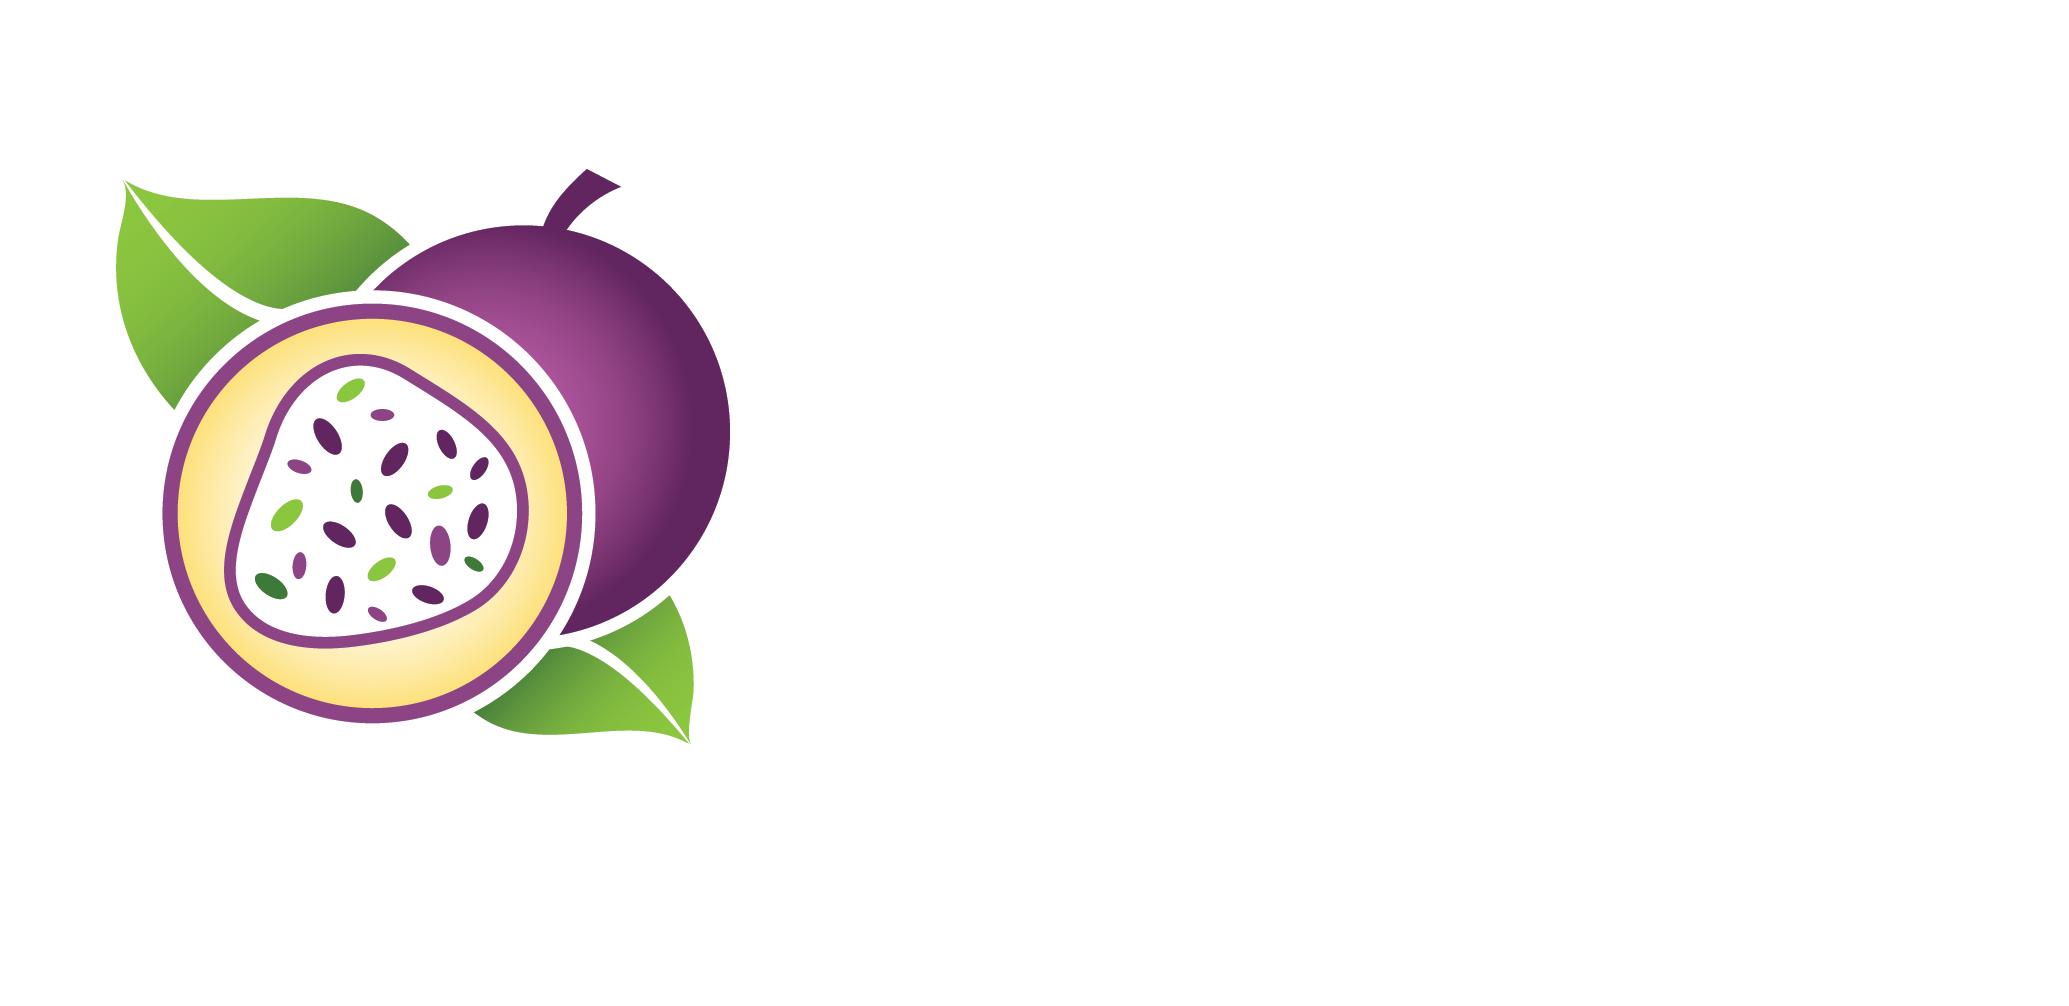 KA_LogoAssets-03.png